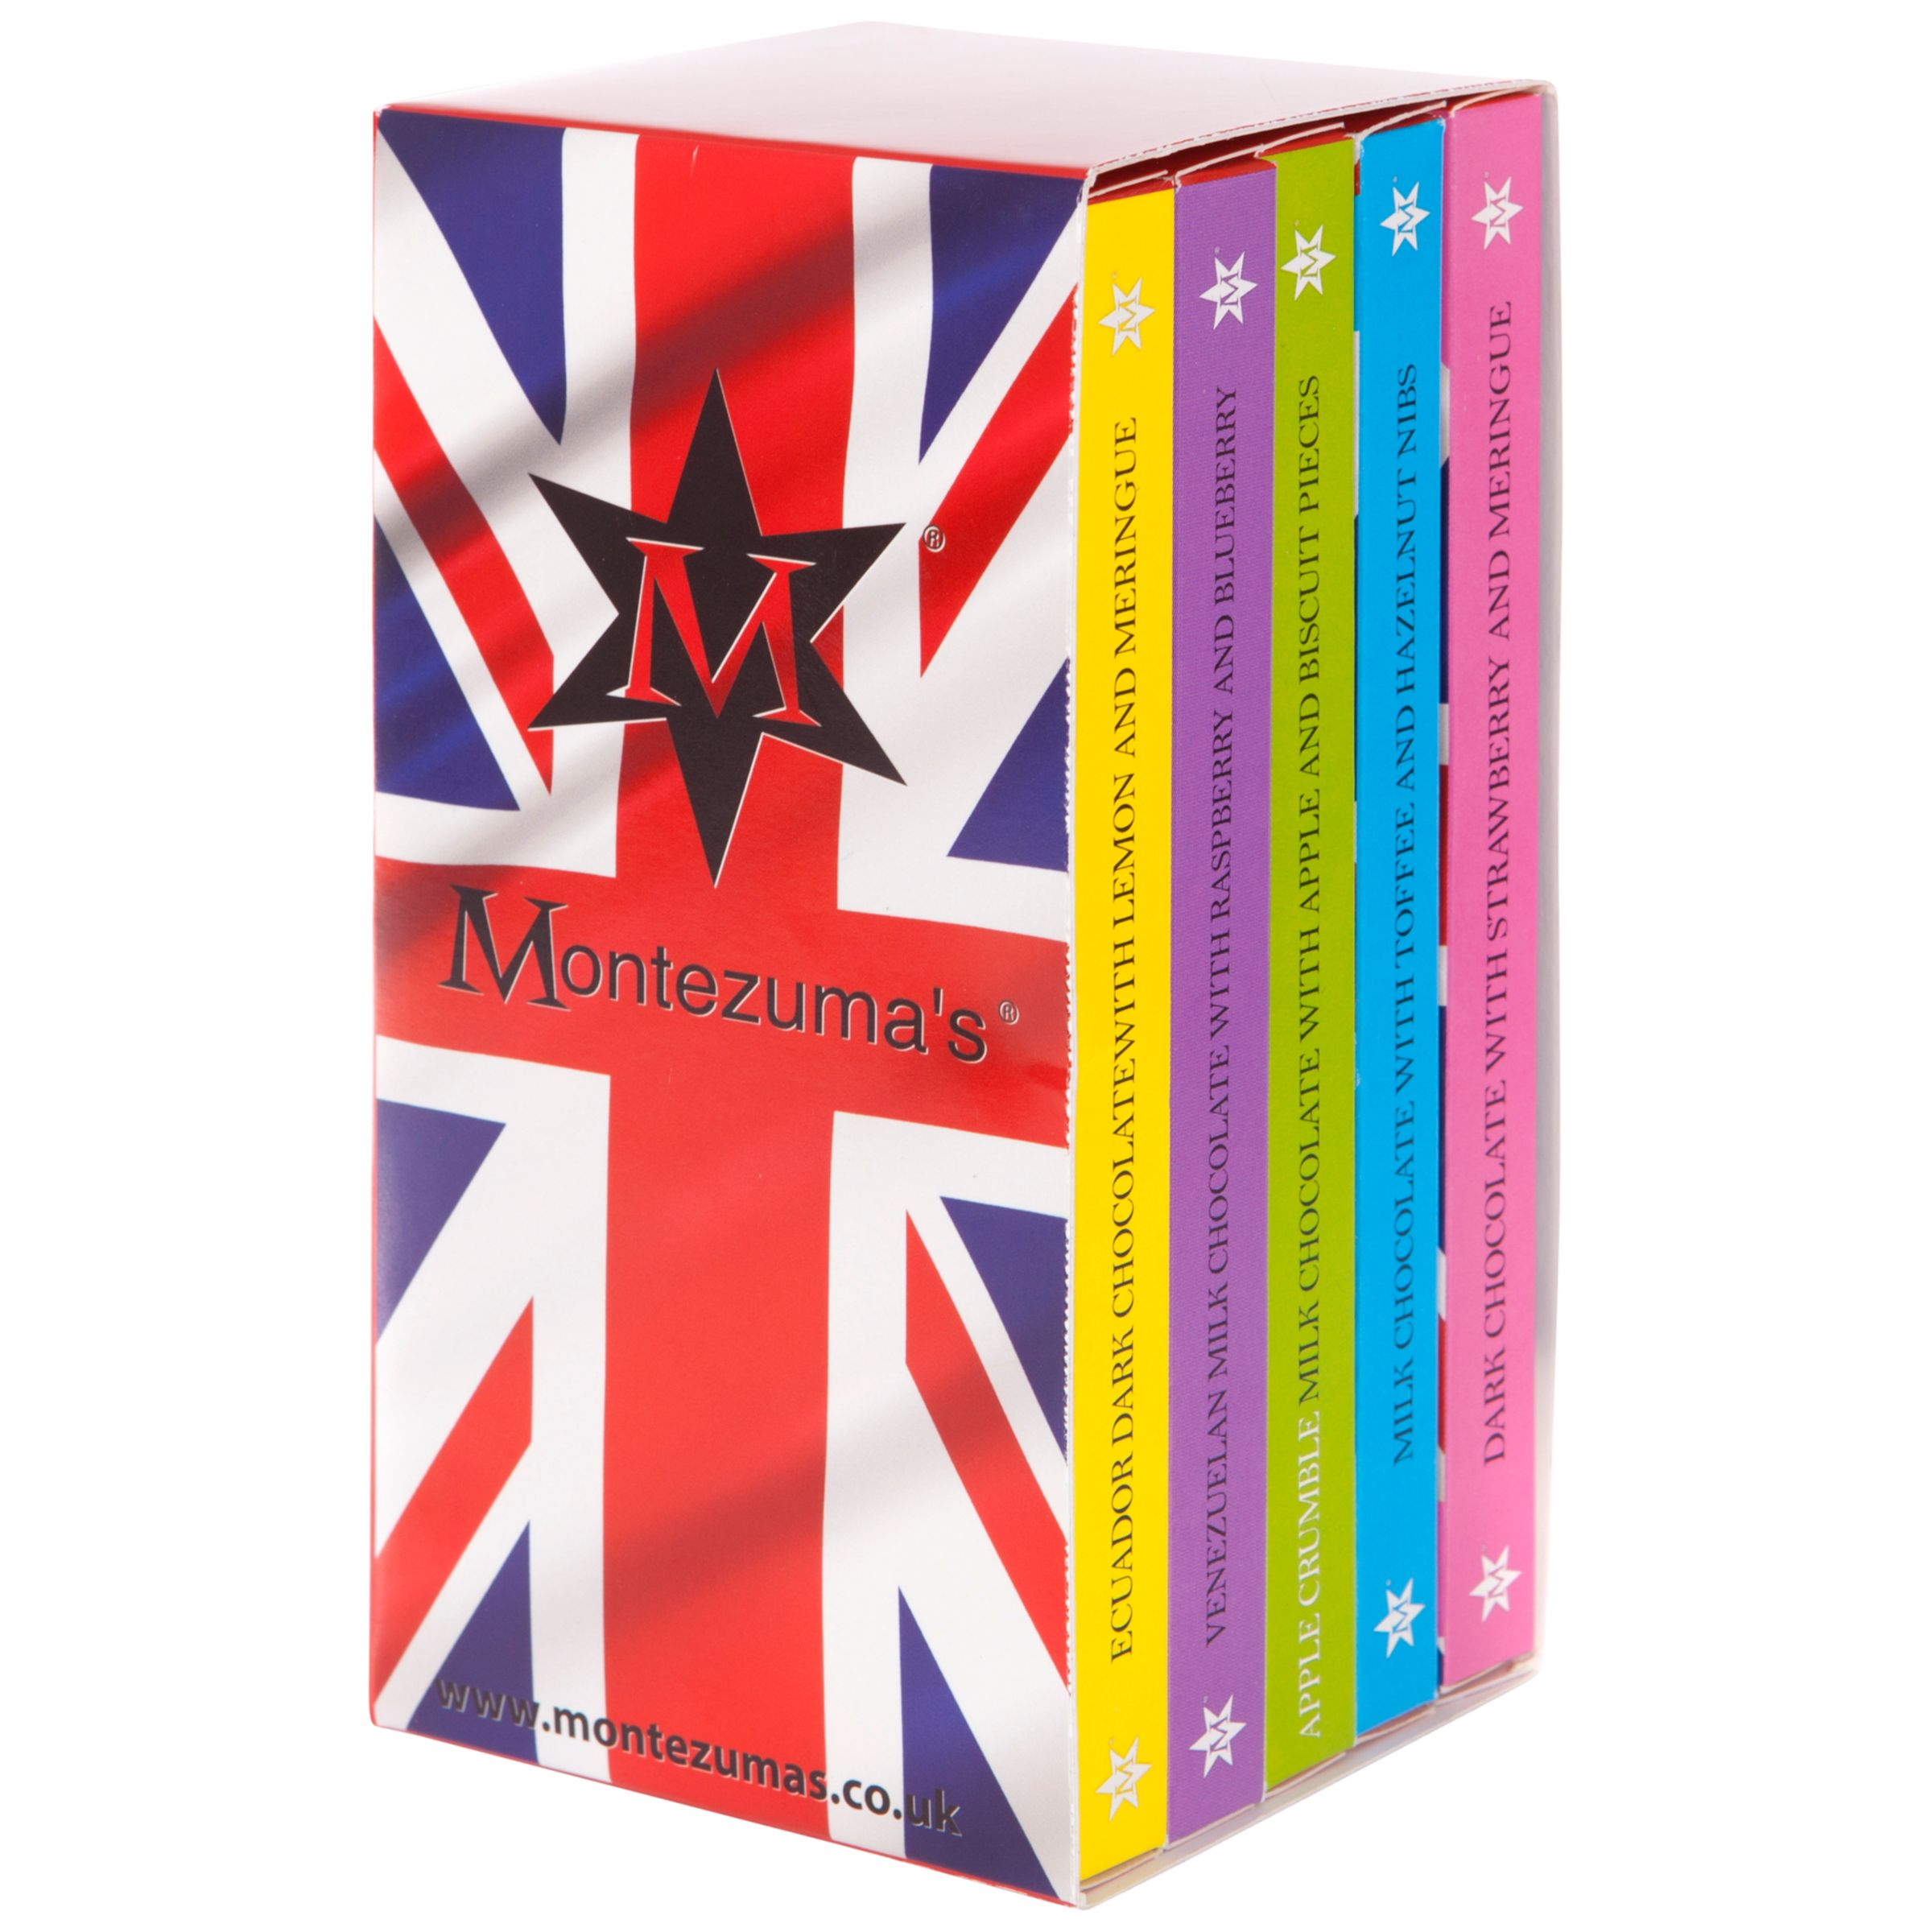 Montezuma's Montezuma's British Pudding Chocolate Bar Library, 500g